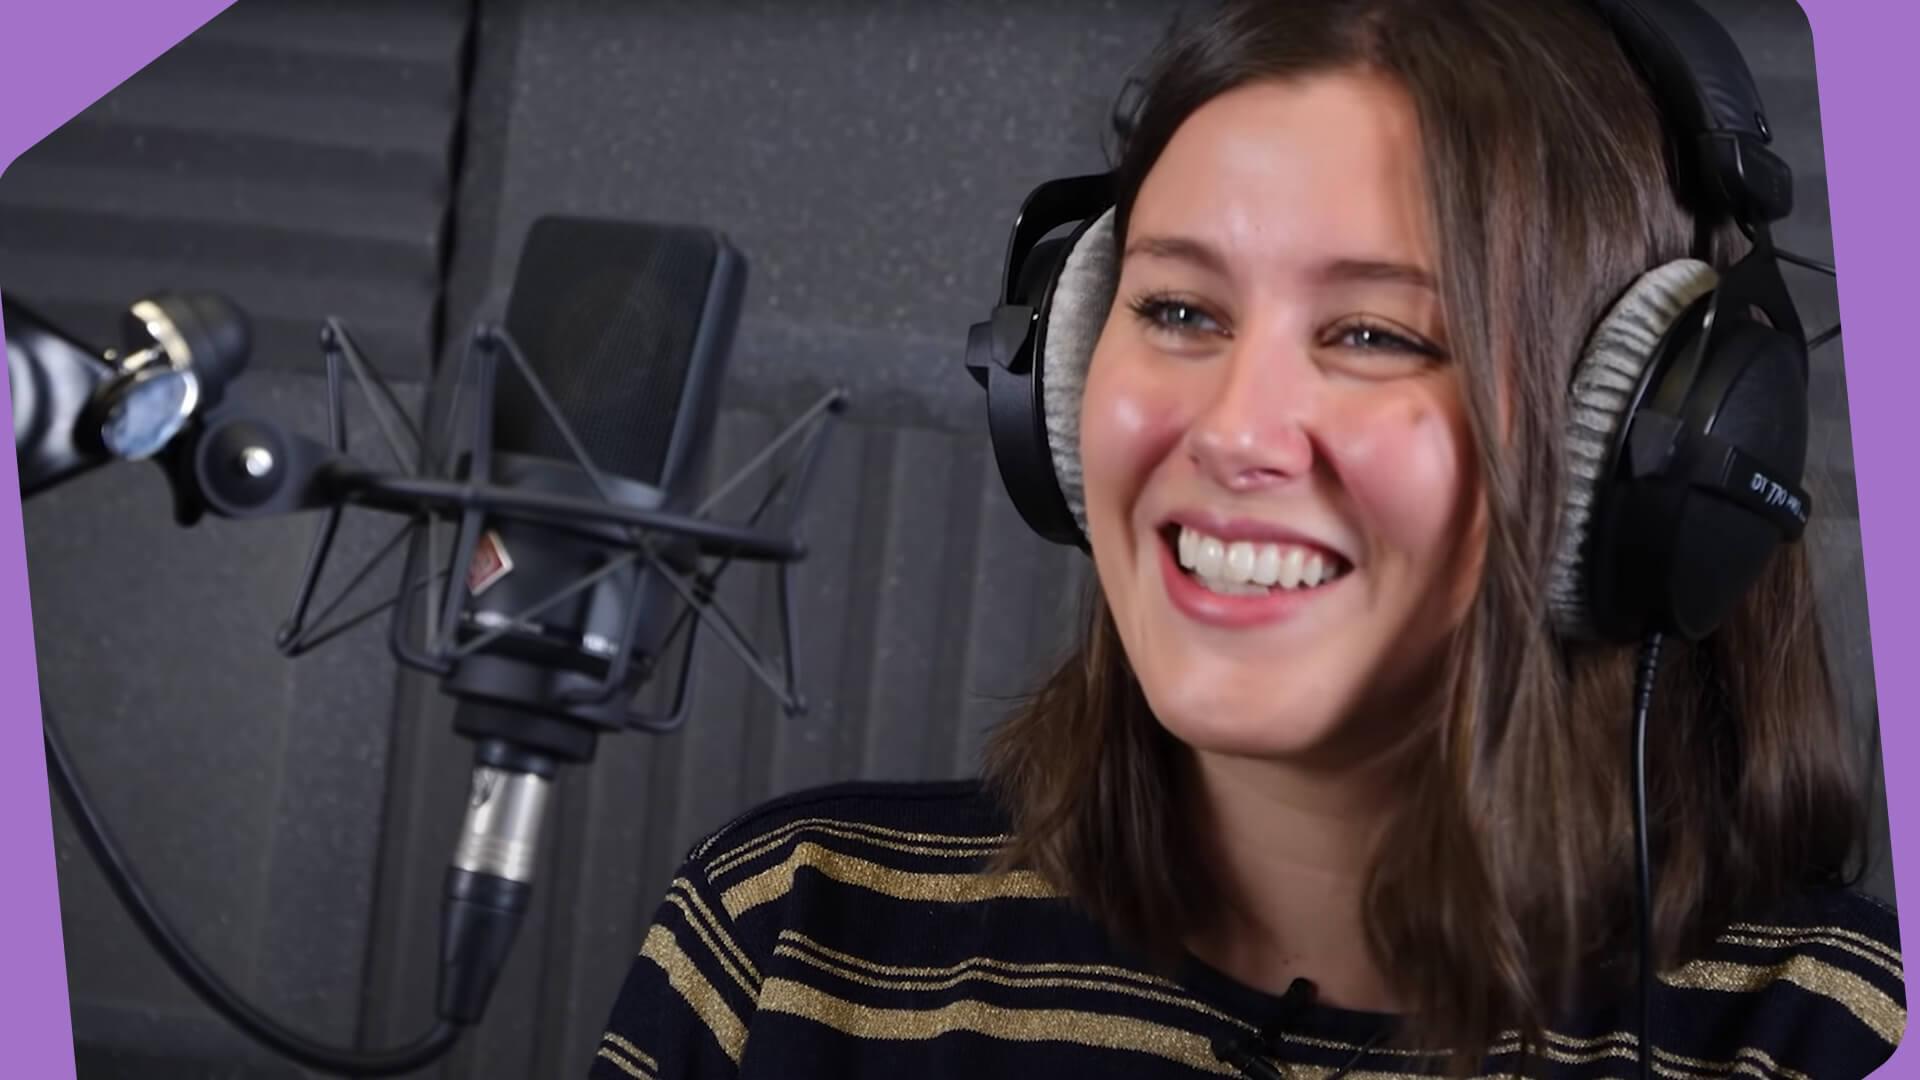 10 things every radio dj says header